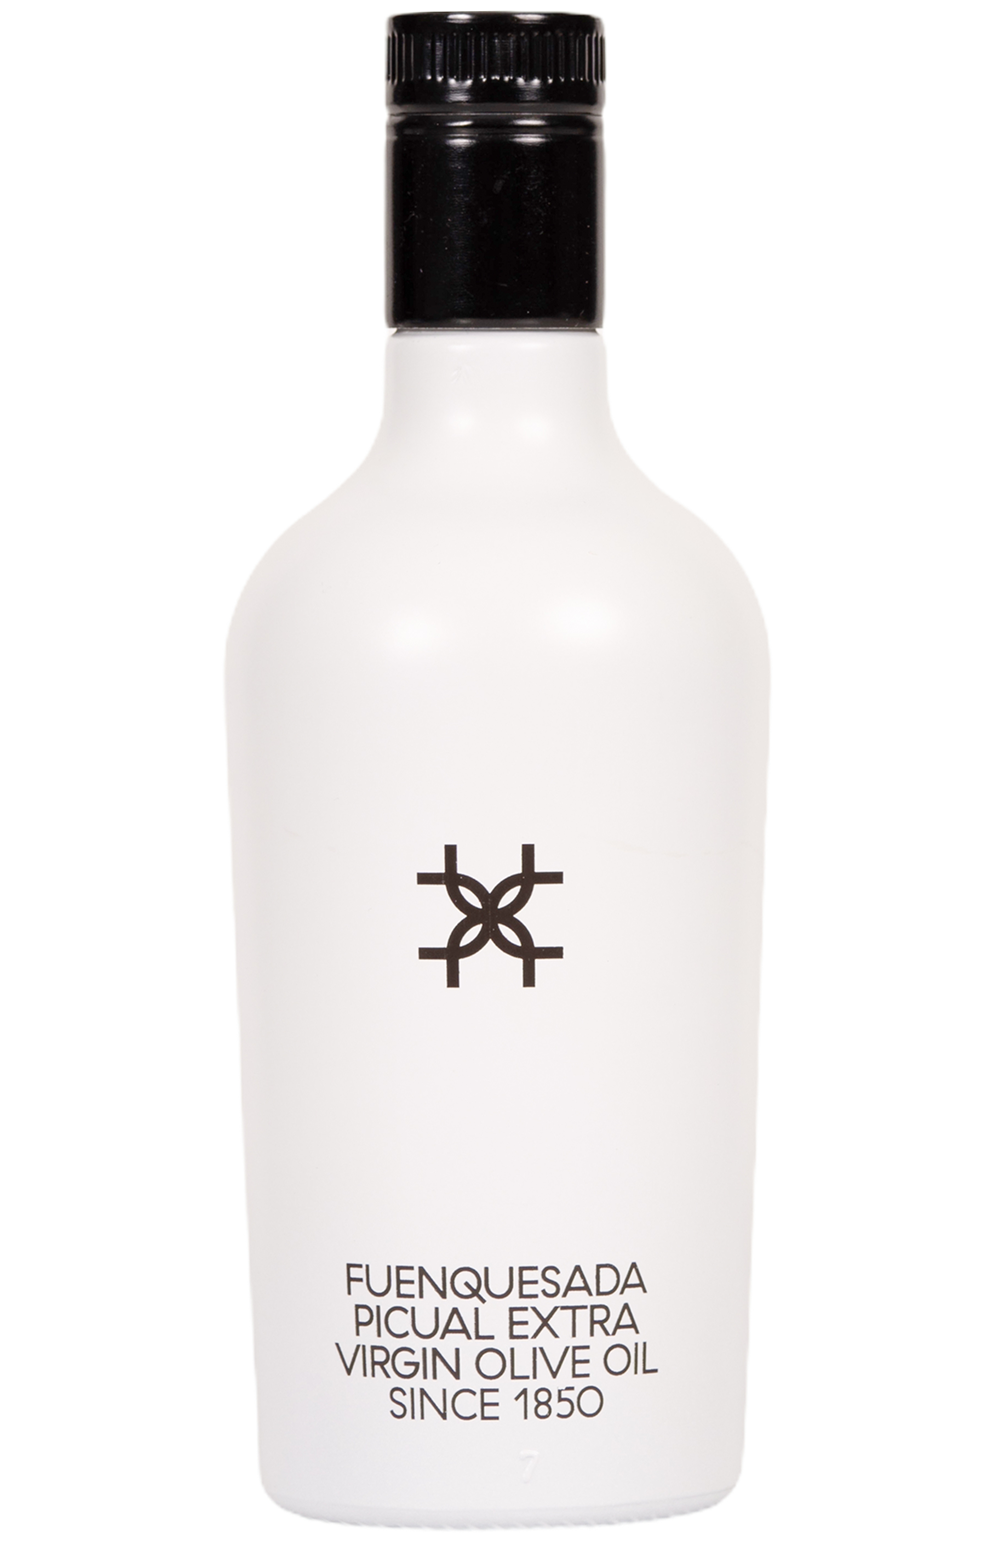 Fuenquesada Picual Extra Virgin Olive Oil since 1850